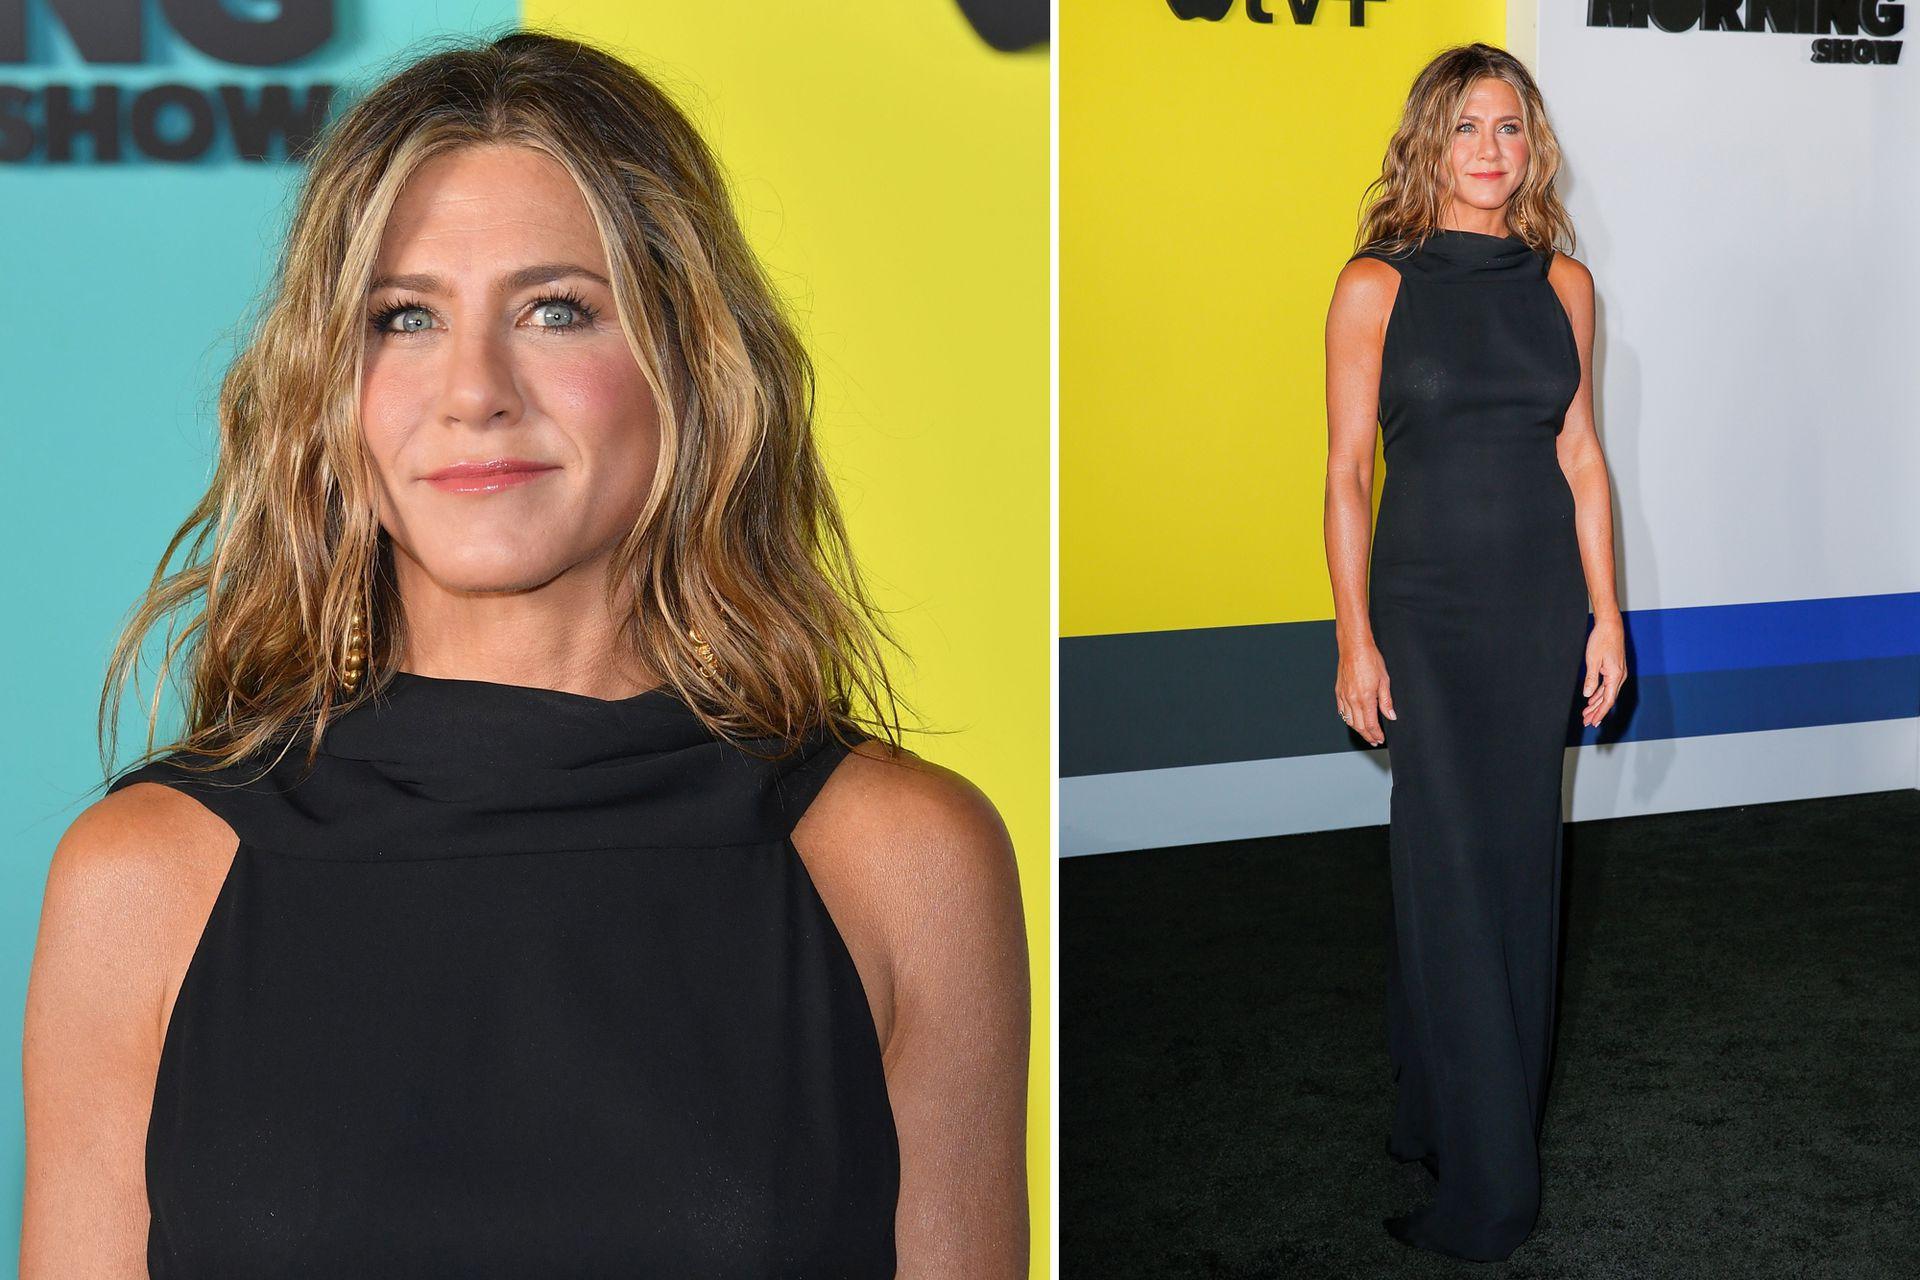 Para la premiere de la serie de AppleTV The Morning Show, Jennifer Aniston eligió una pieza vintage en azul profundo de James Galanos